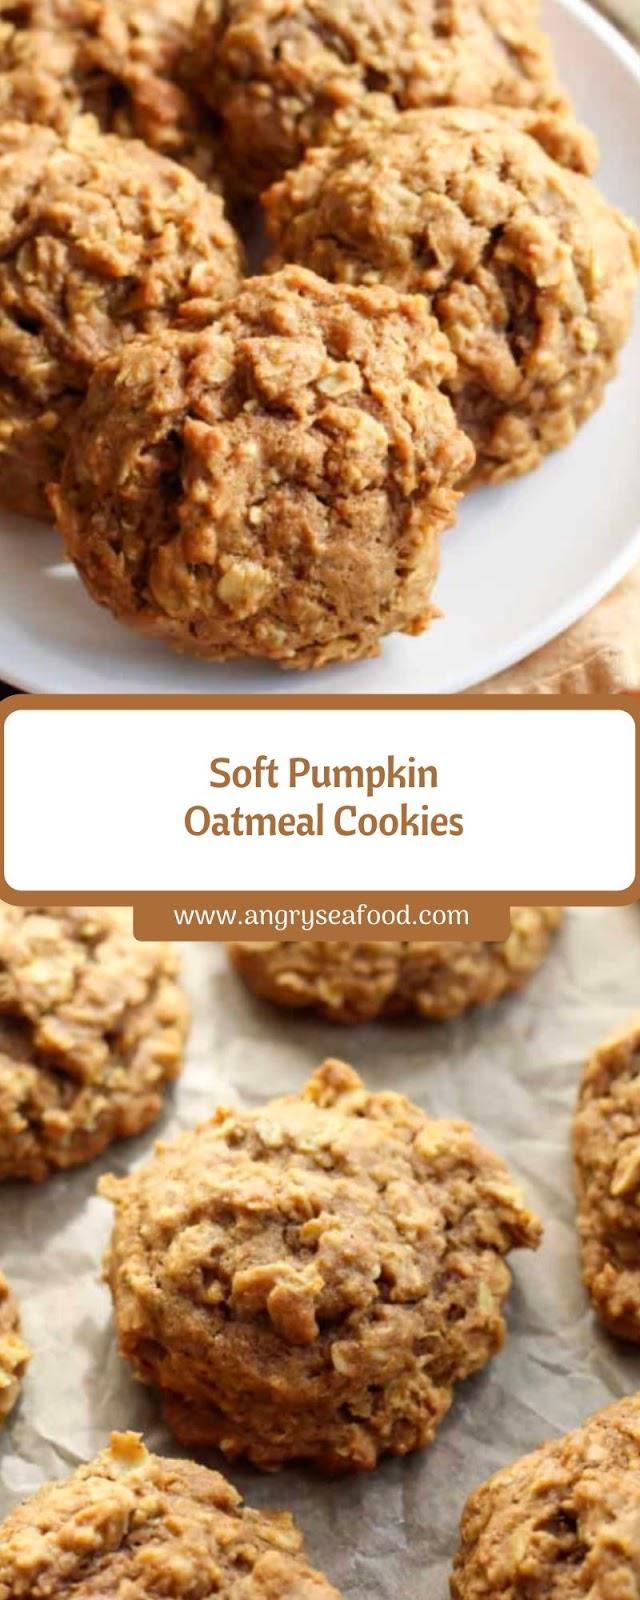 Soft Pumpkin Oatmeal Cookies